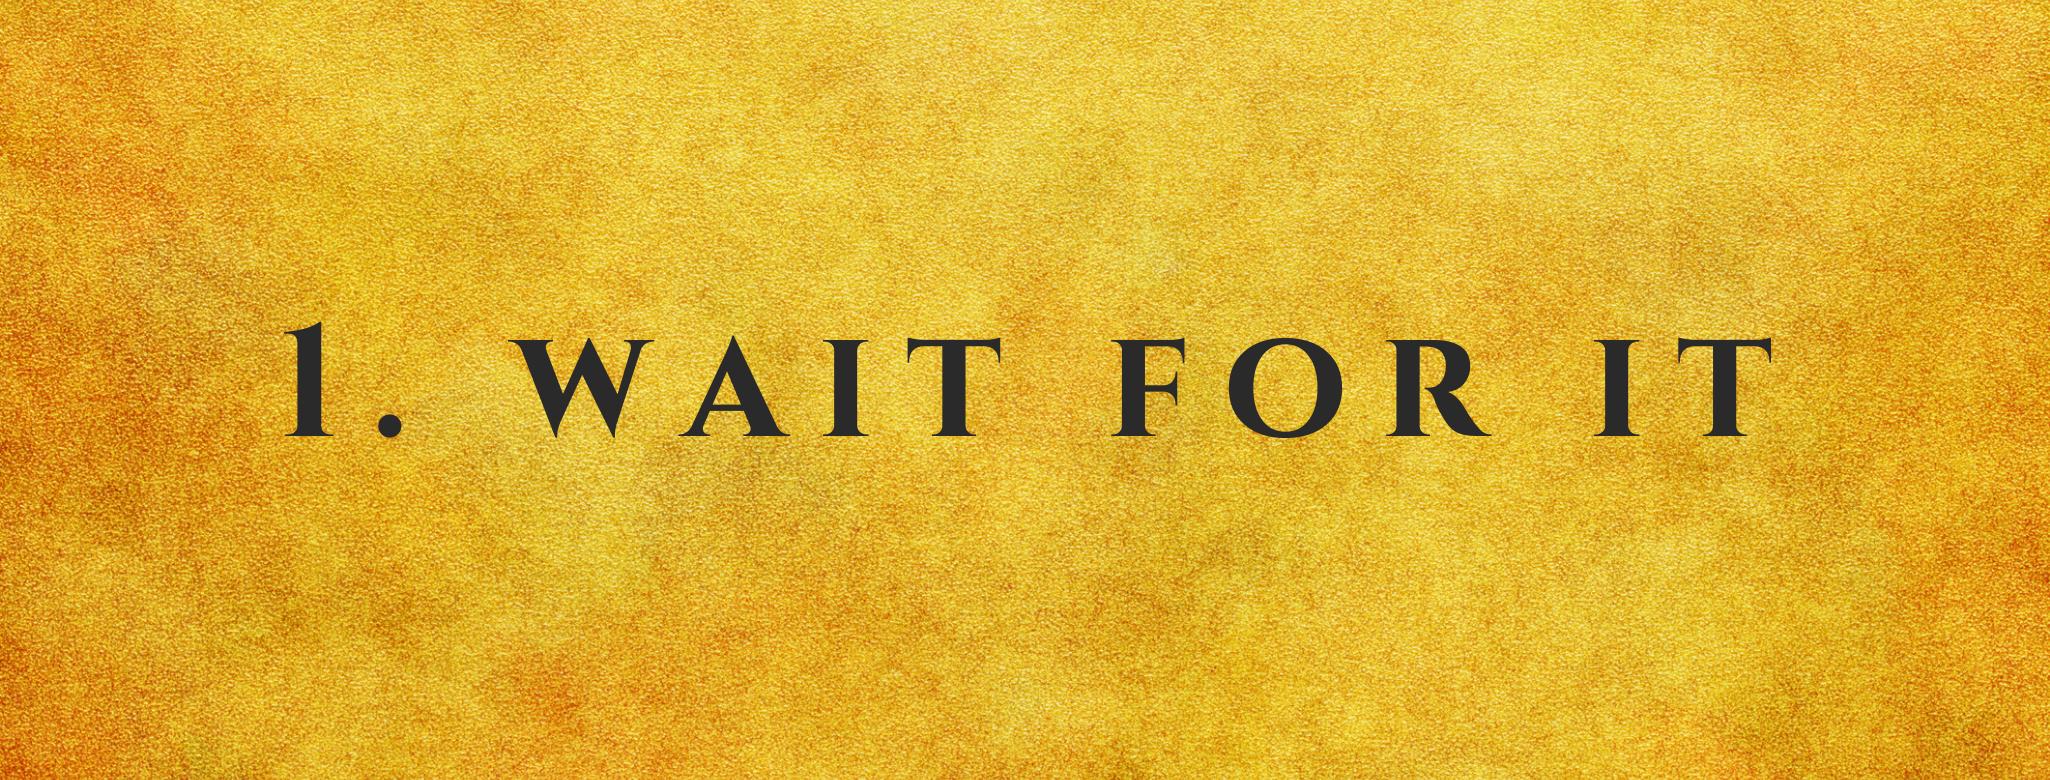 #1 Wait For It